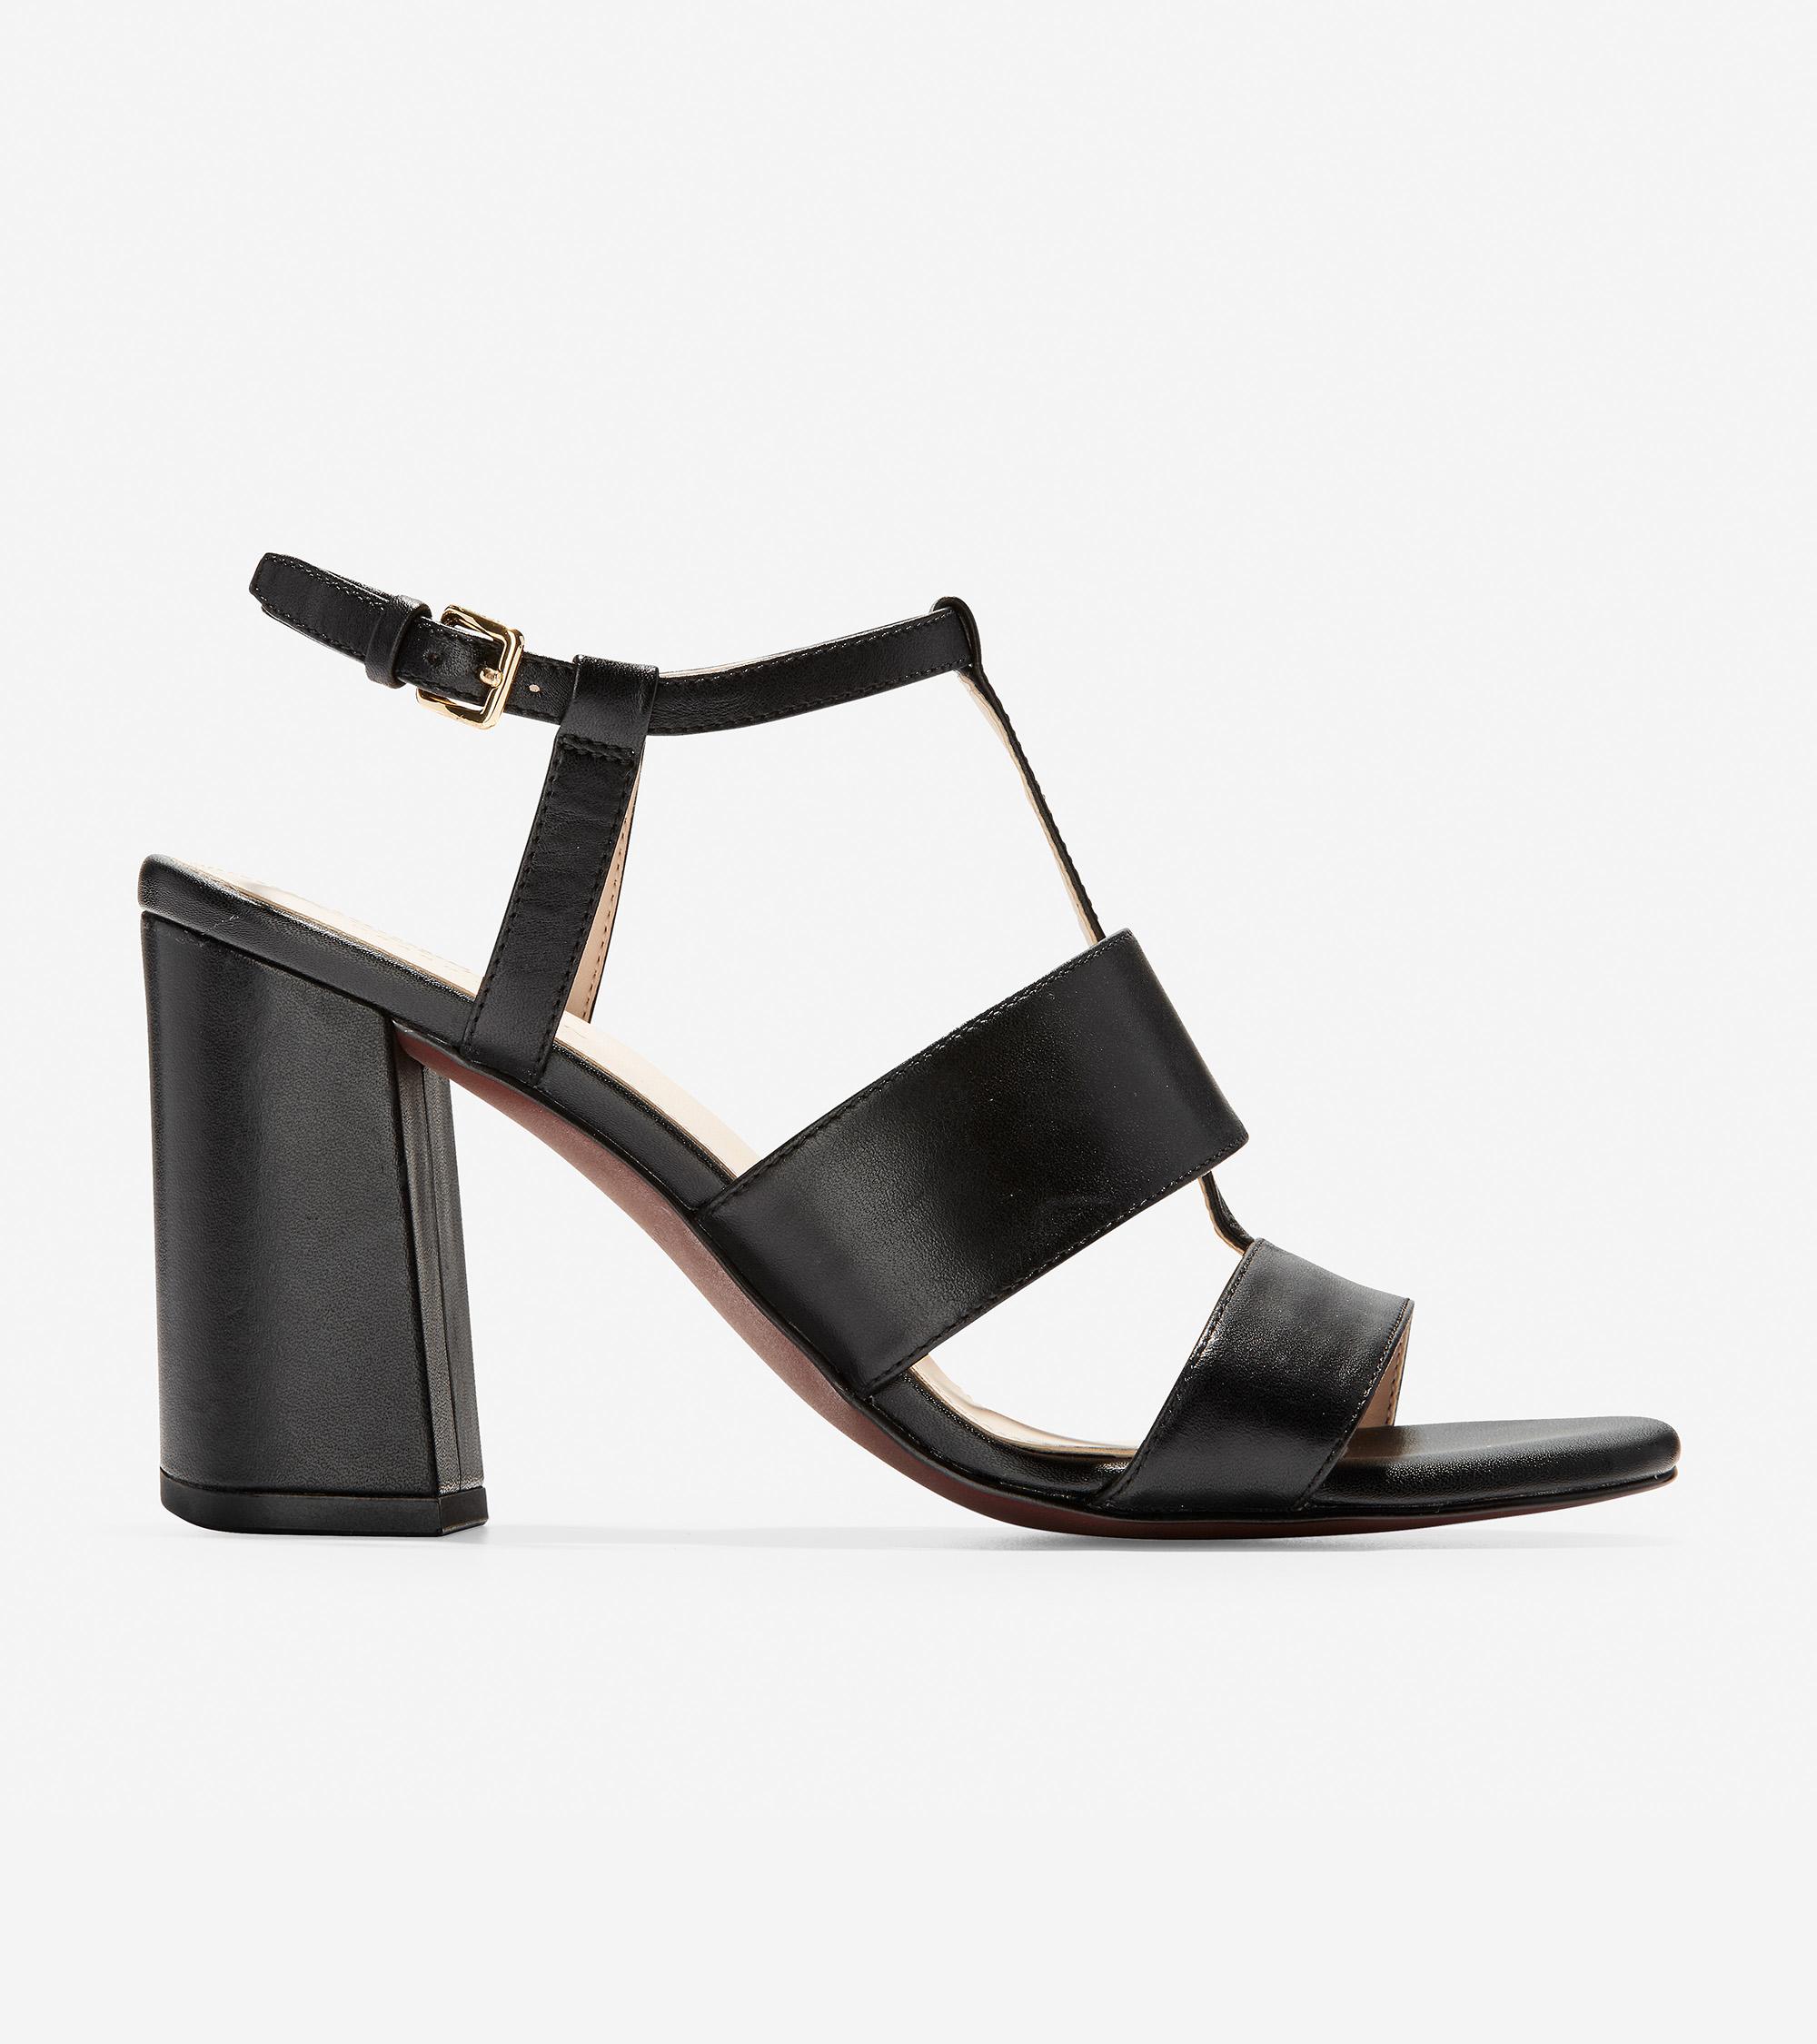 5d9ee3f29c4 Cherie Grand Block Heel Sandal (85mm)